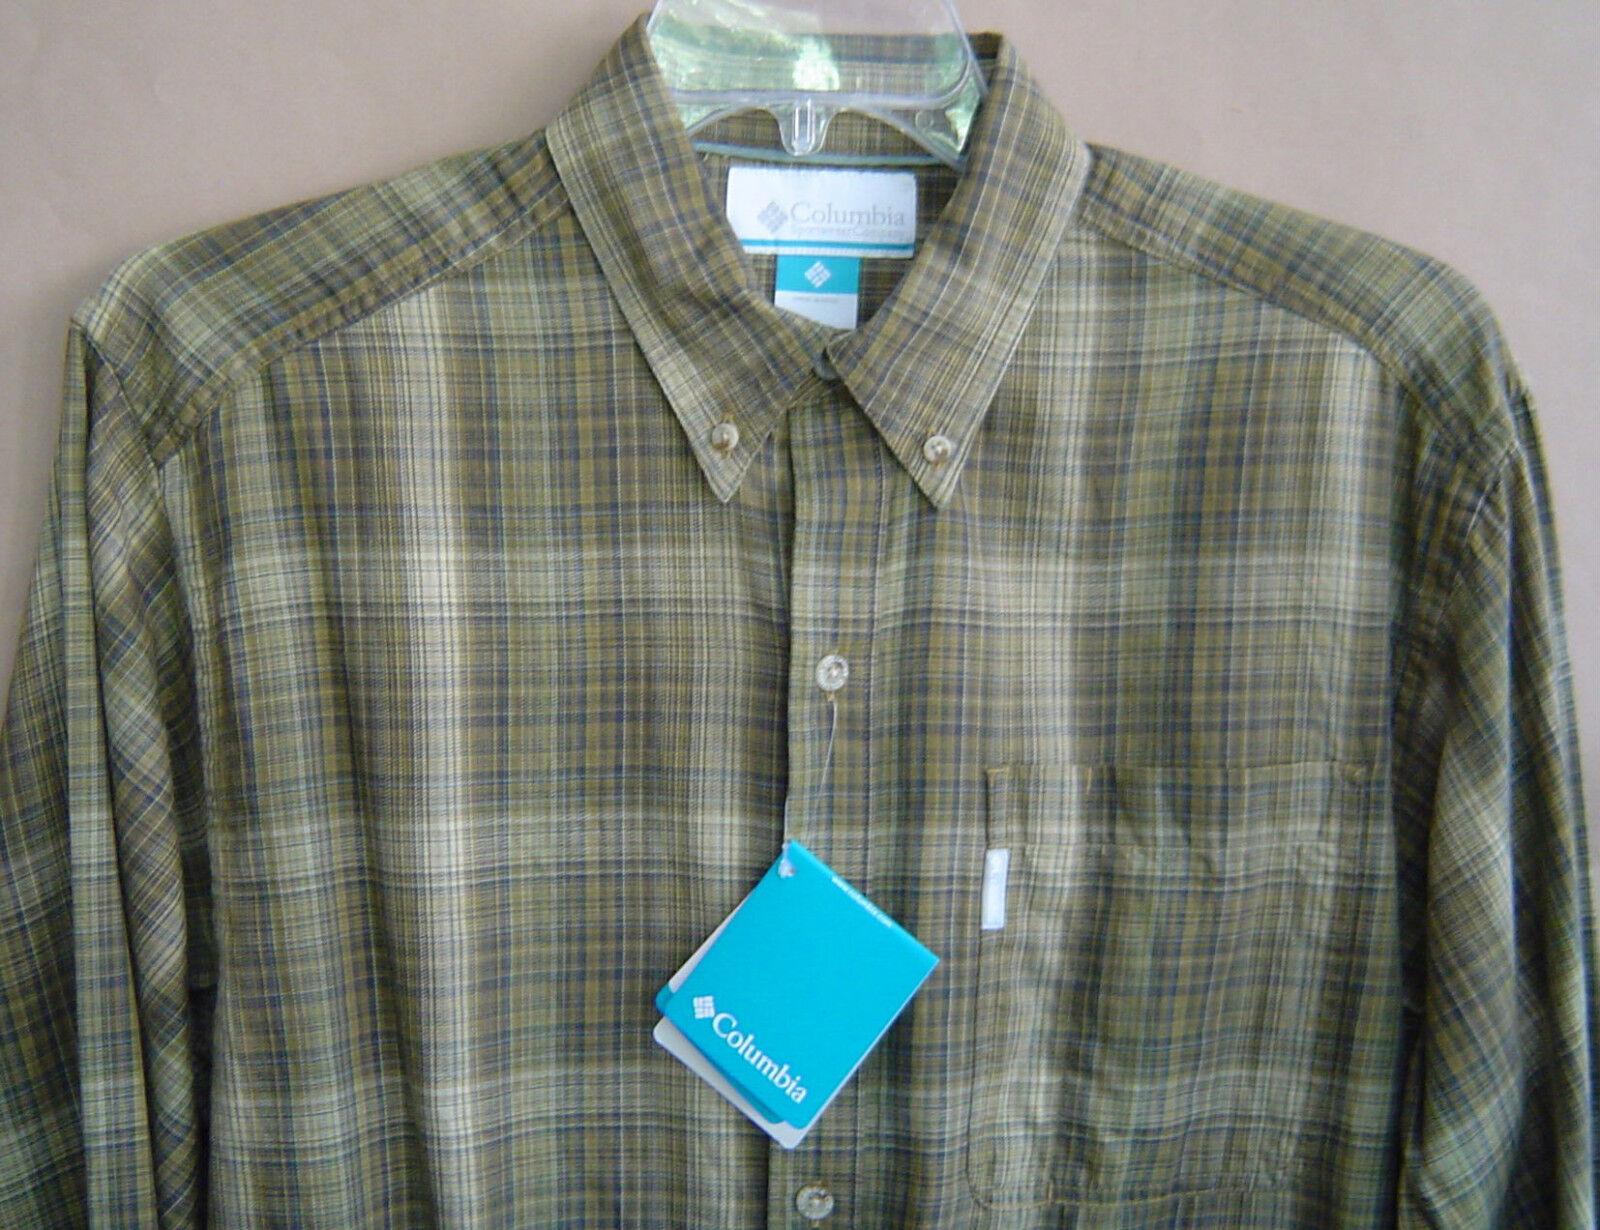 NWT  COLUMBIA NORTH BOUND WAY Mens M Shirt BRONZE PLAID L S Cotton AM7517-968